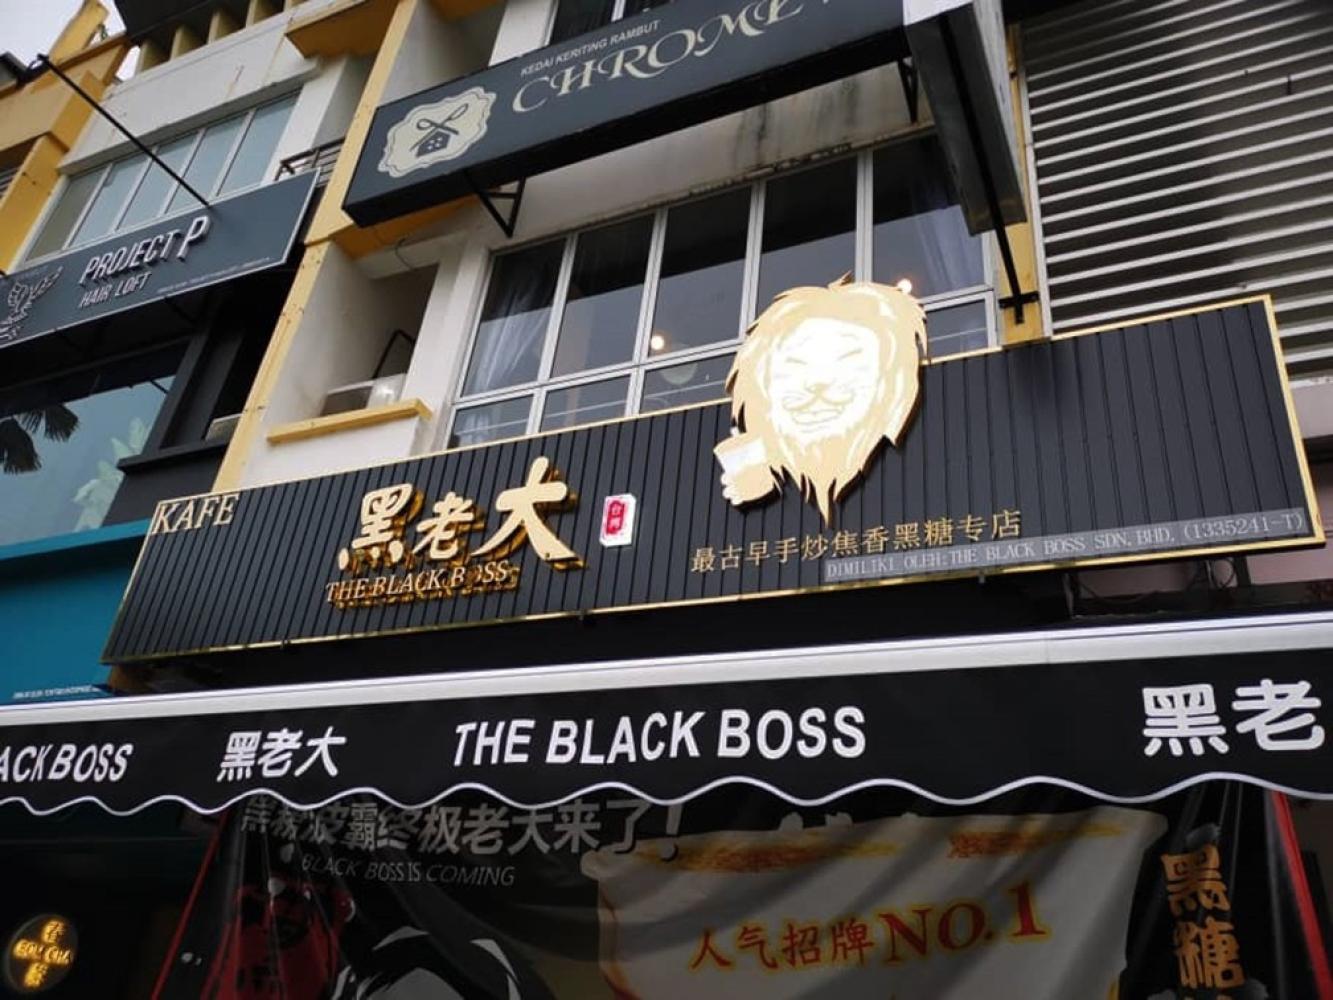 The Black Boss